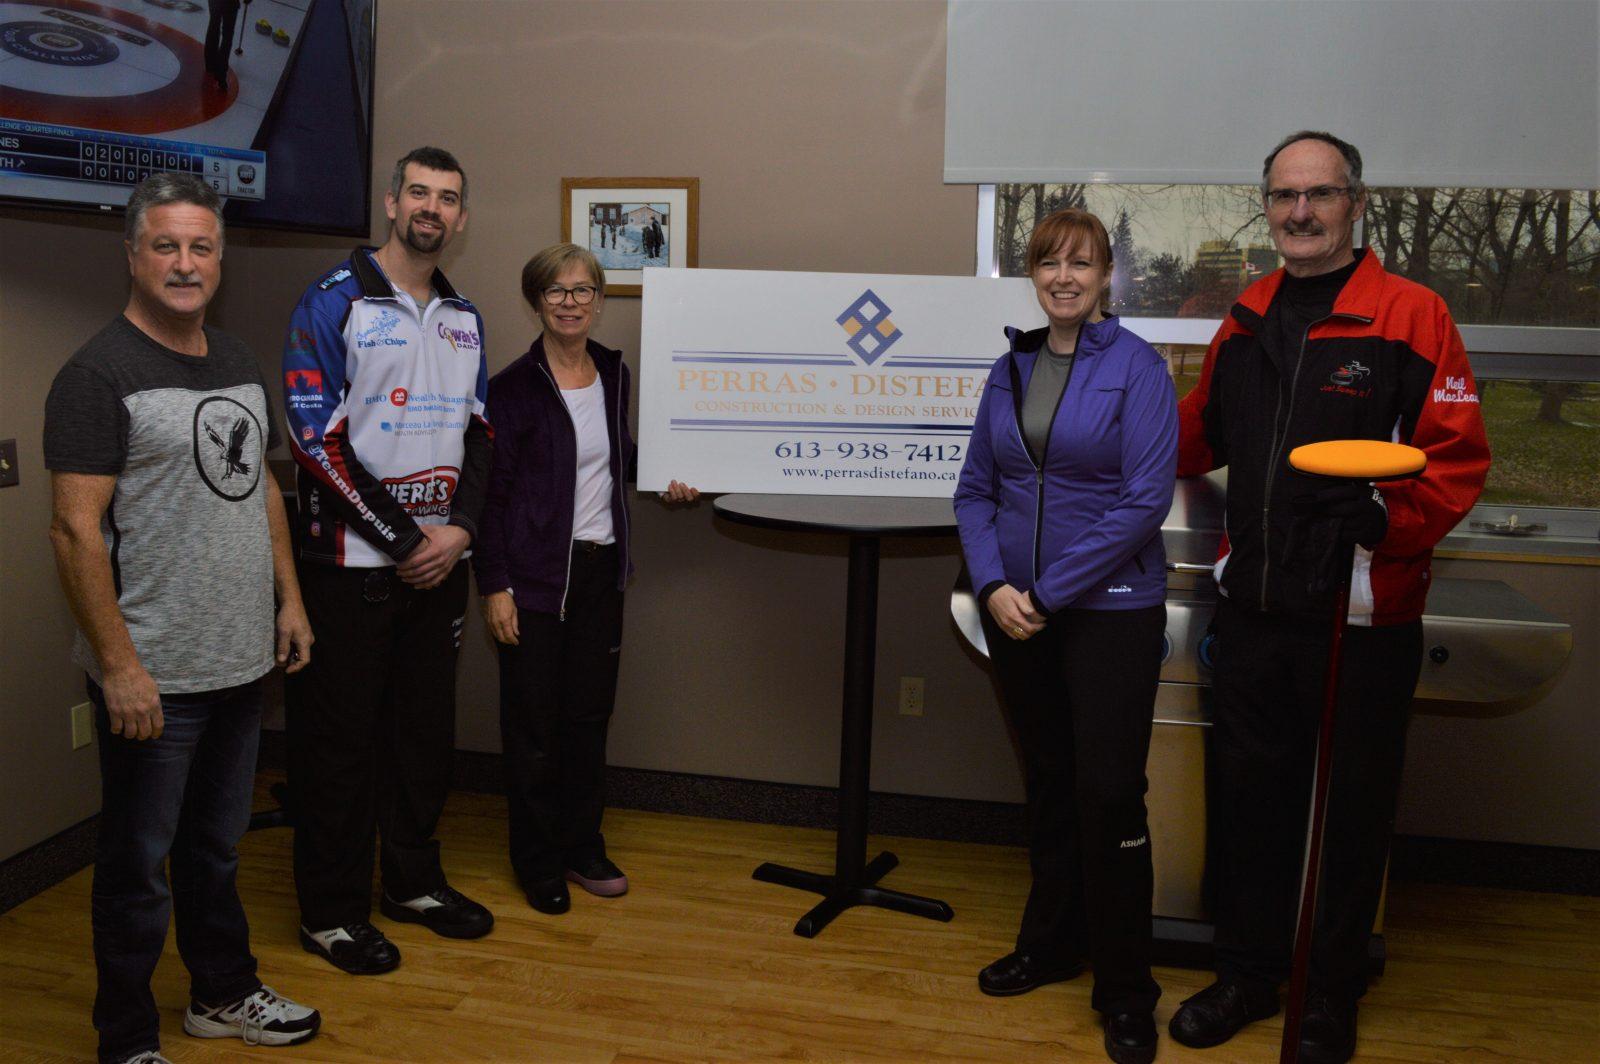 Region's curlers in Cornwall for Julie Bridger Bonspiel